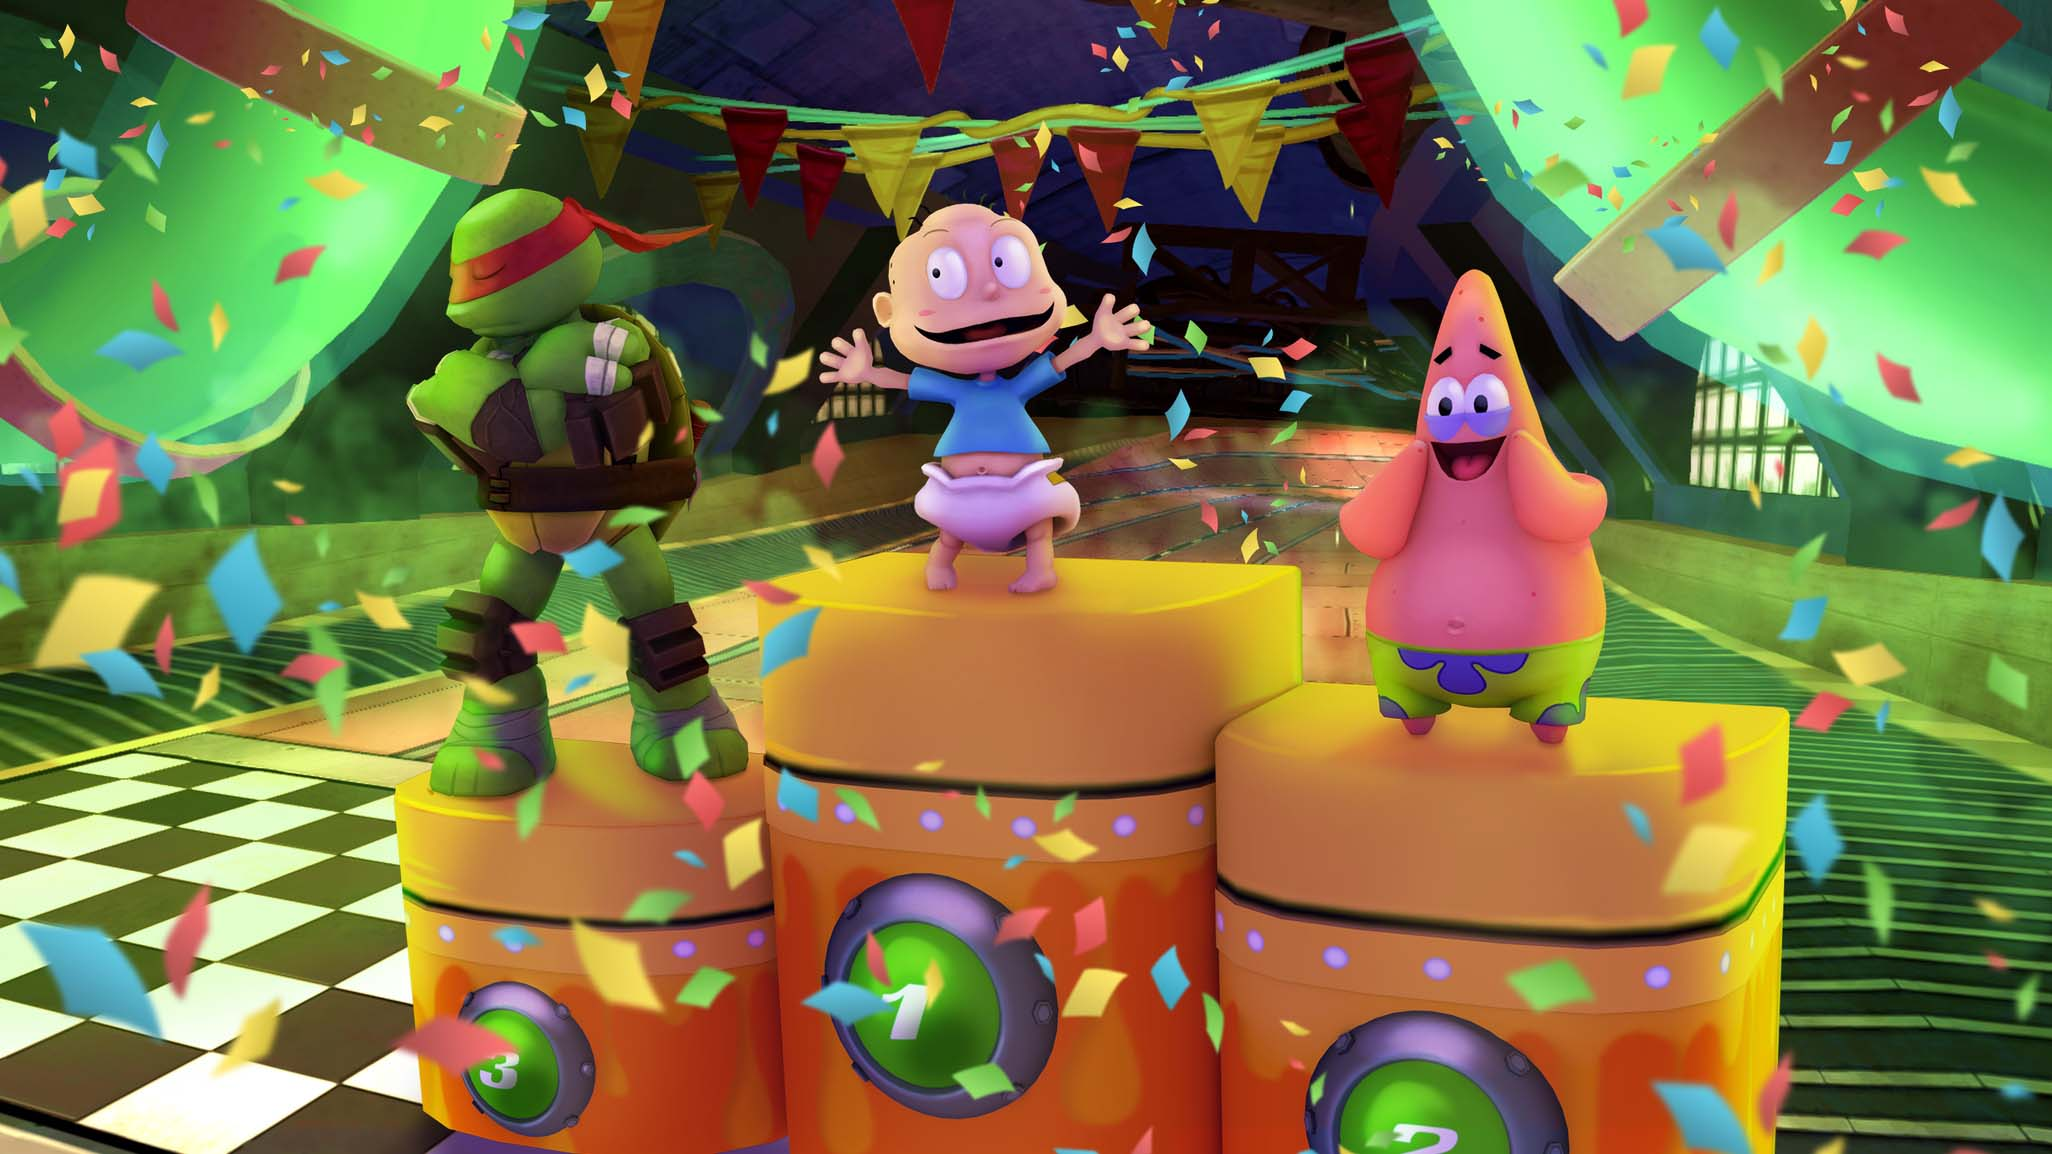 Jogabilidade de estreia para Nickelodeon Kart Racers